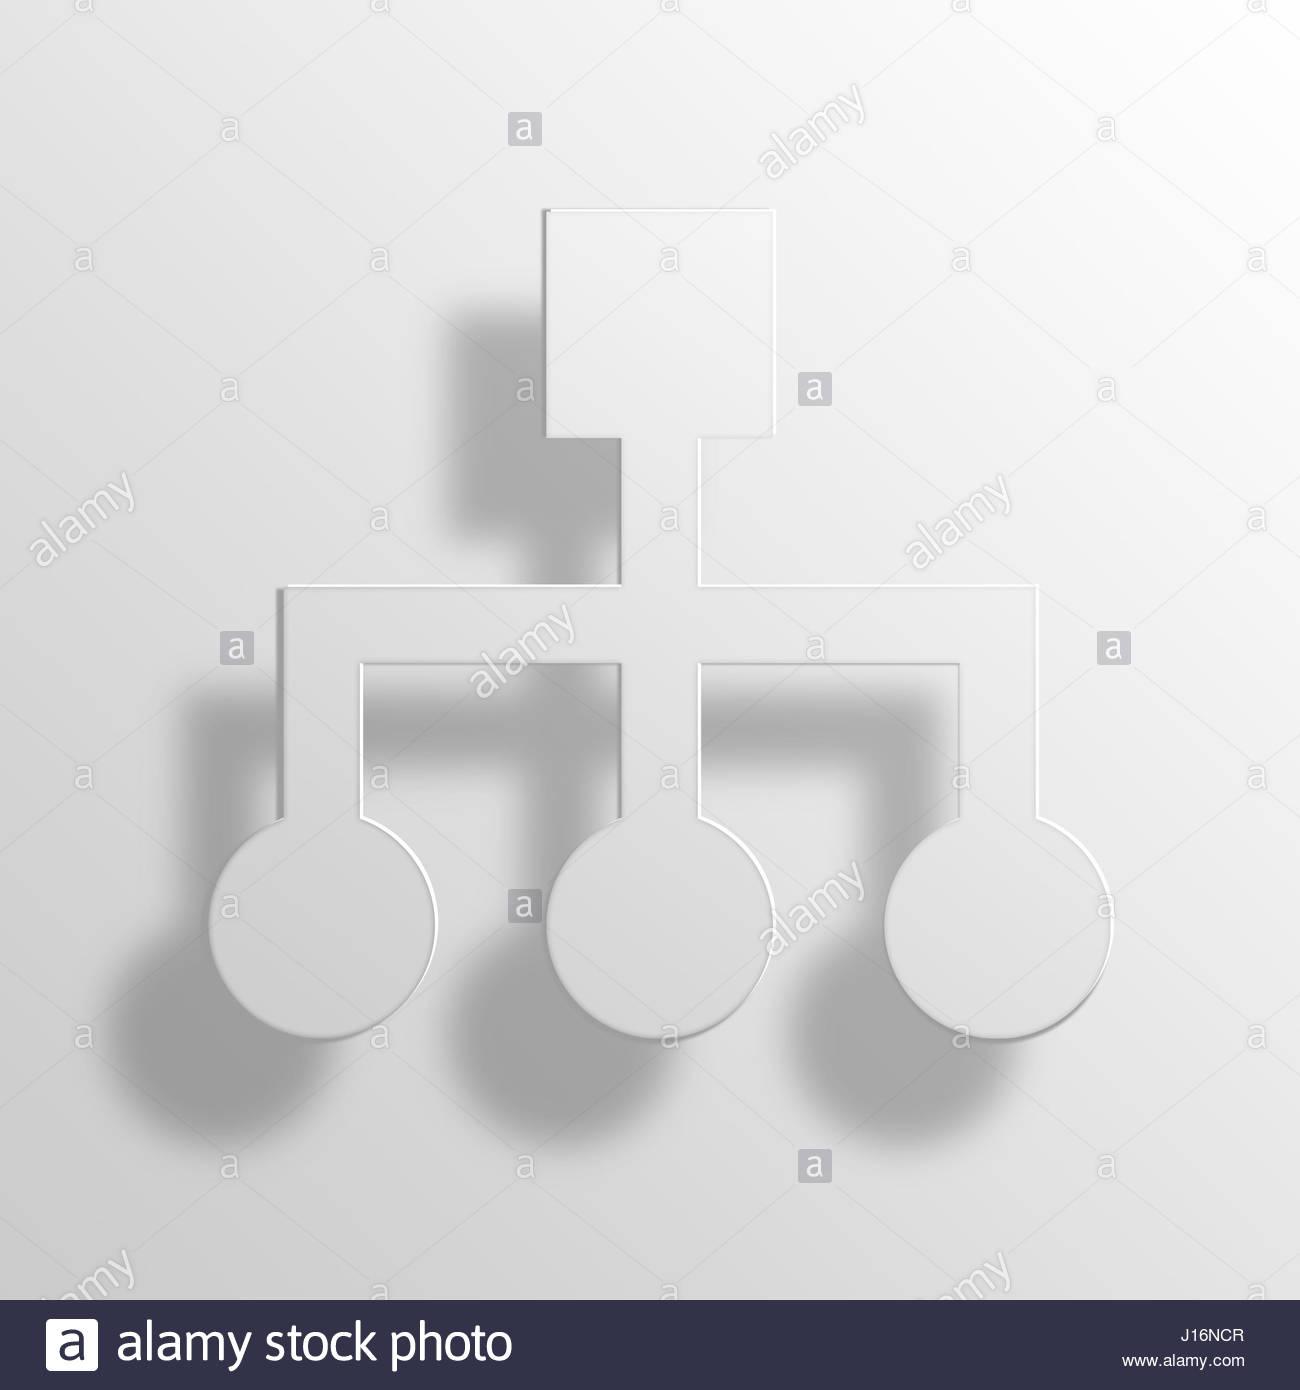 Wunderbar Symboldiagramm Galerie - Verdrahtungsideen - korsmi.info